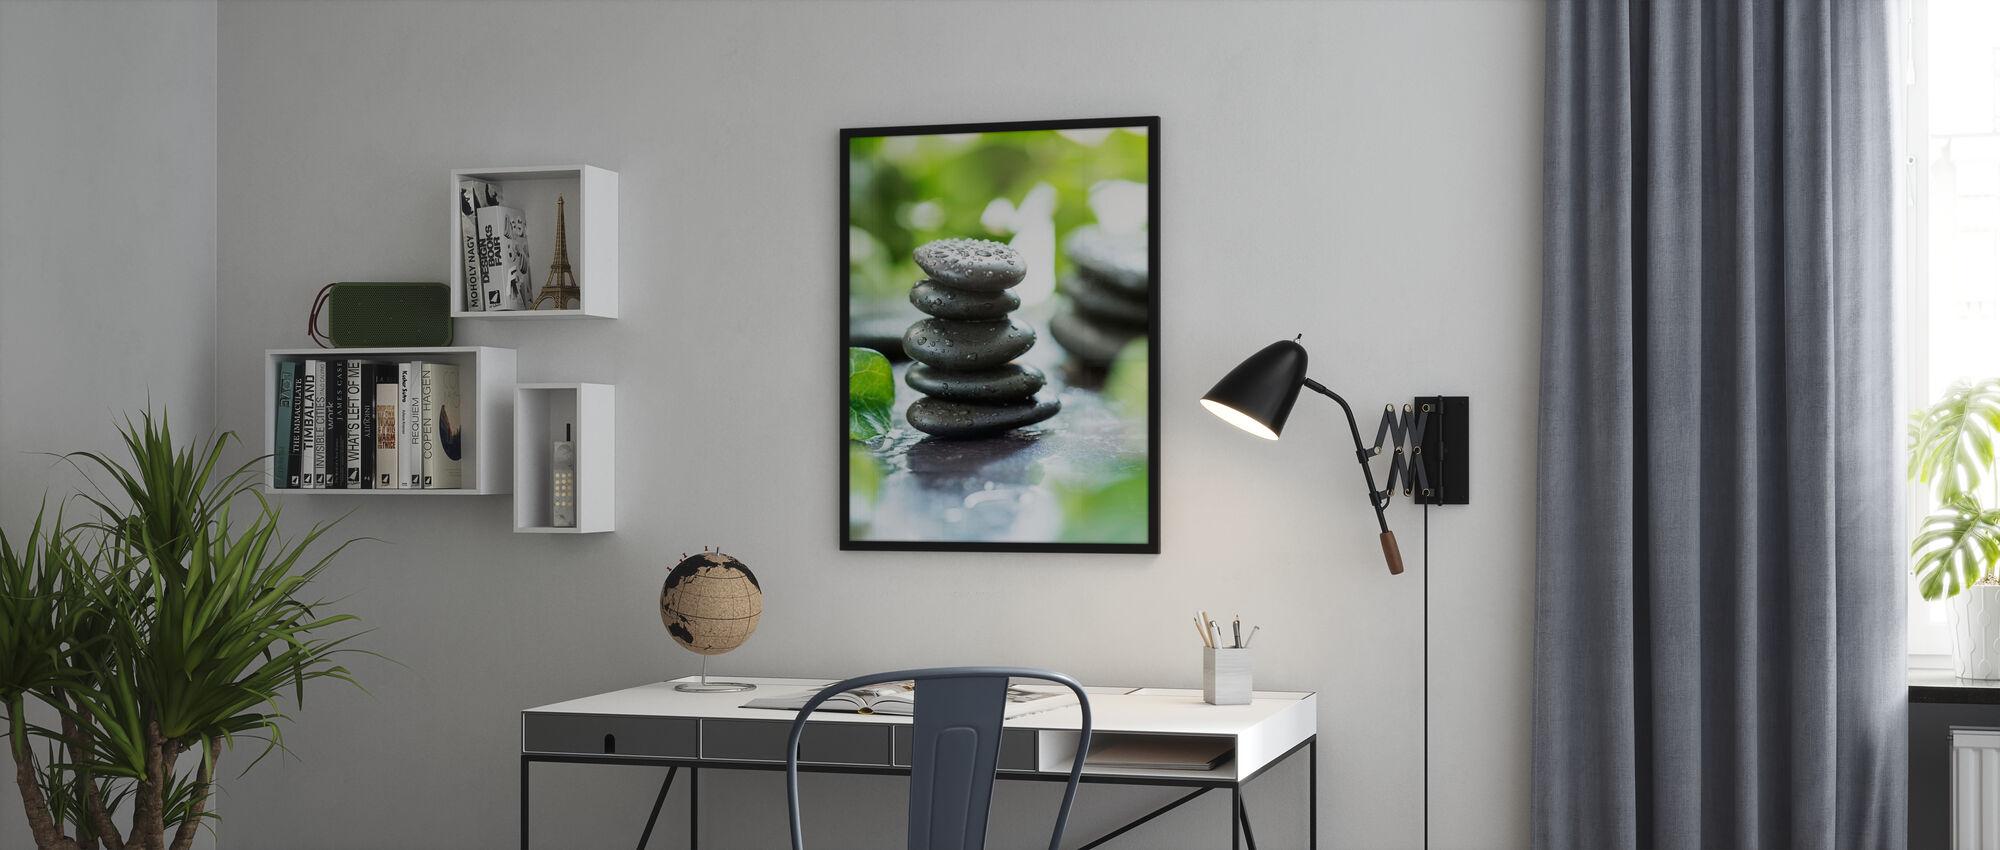 Zen Pebbles - Inramad tavla - Kontor